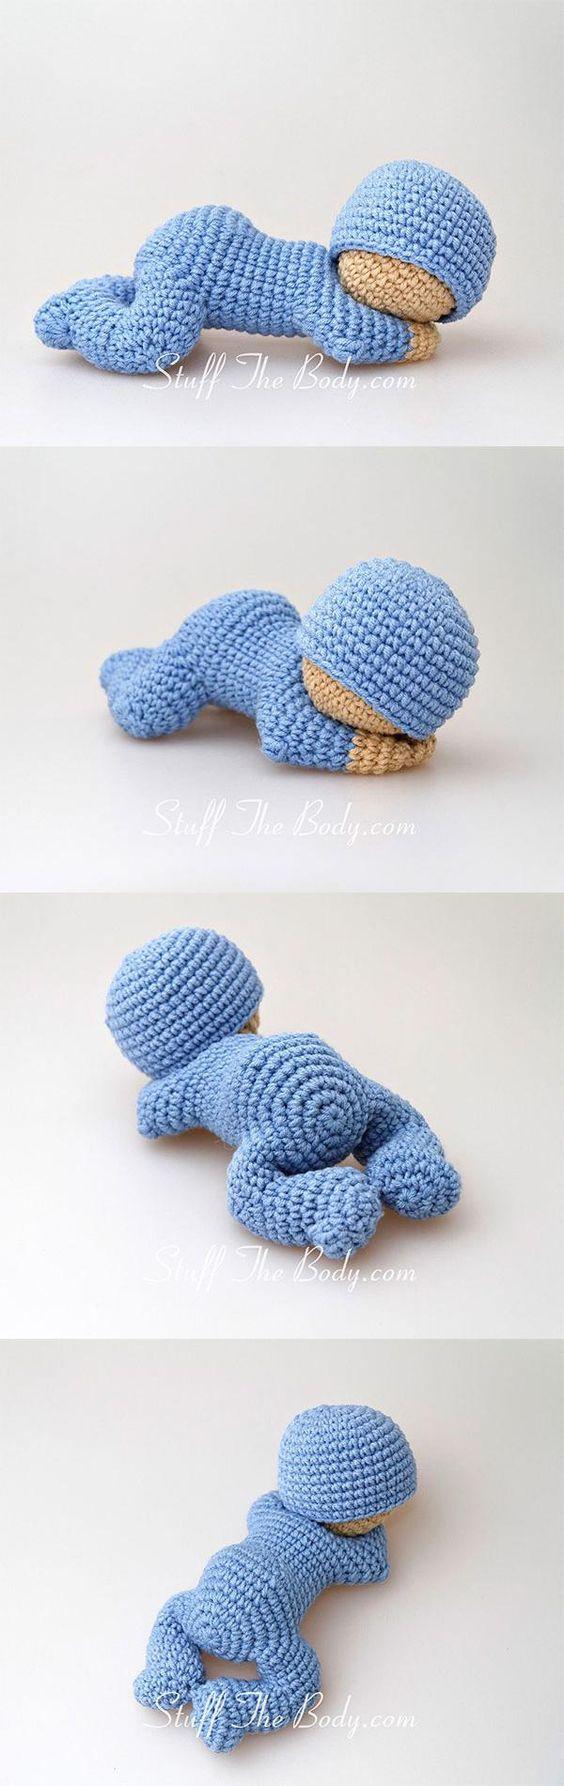 Sleeping baby amigurumi pattern by StuffTheBody | Muñecas de crochet ...